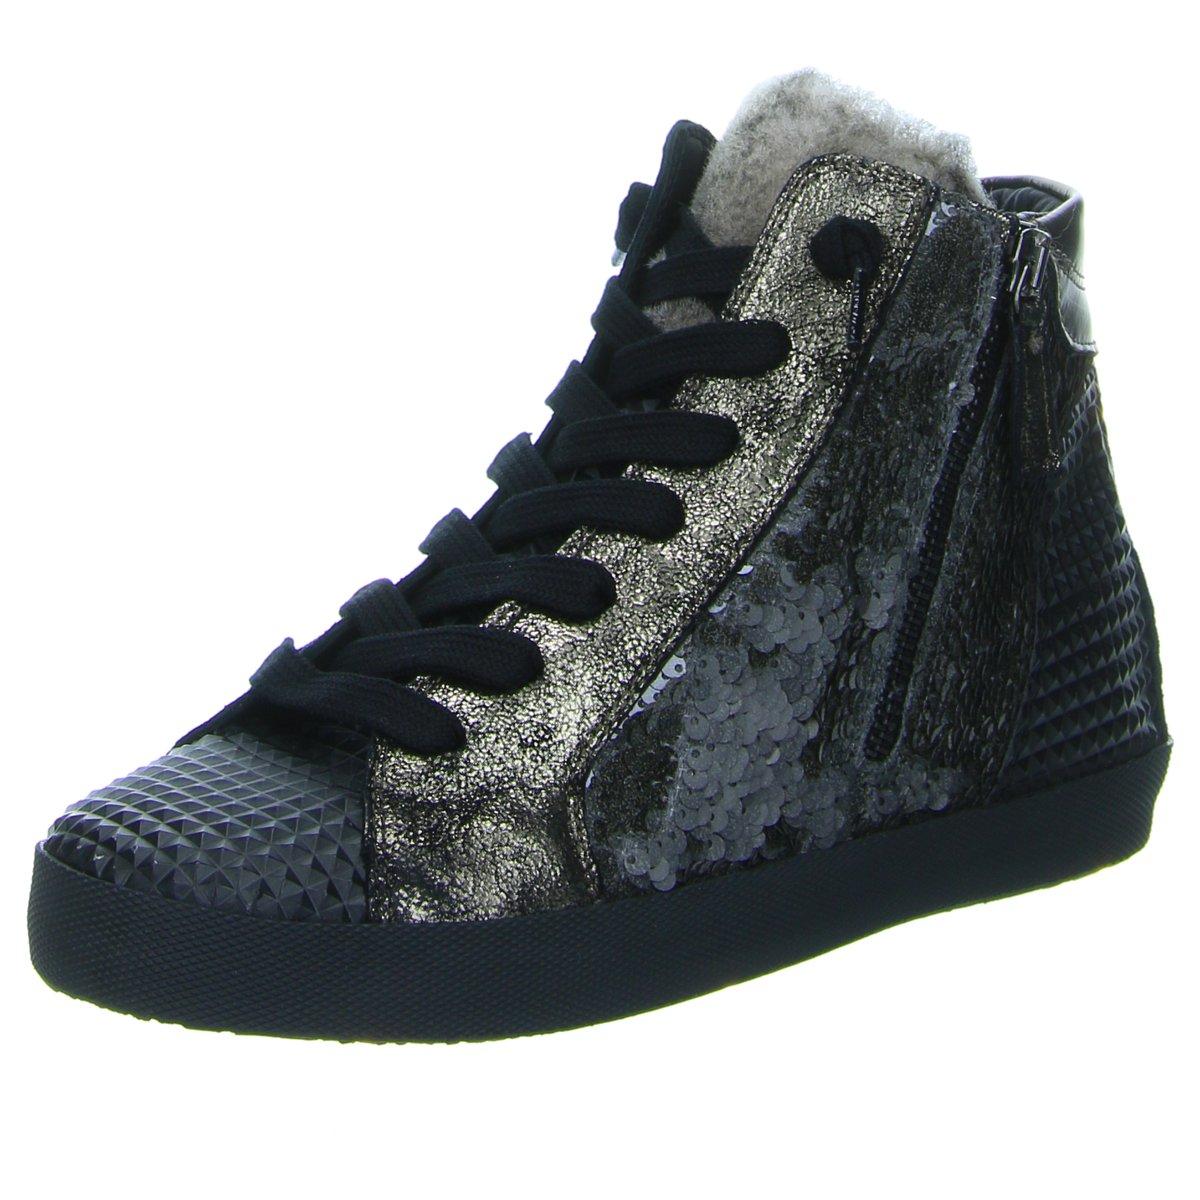 NEU Donna Carolina Damen Sneaker 32.402.052 braun 181350